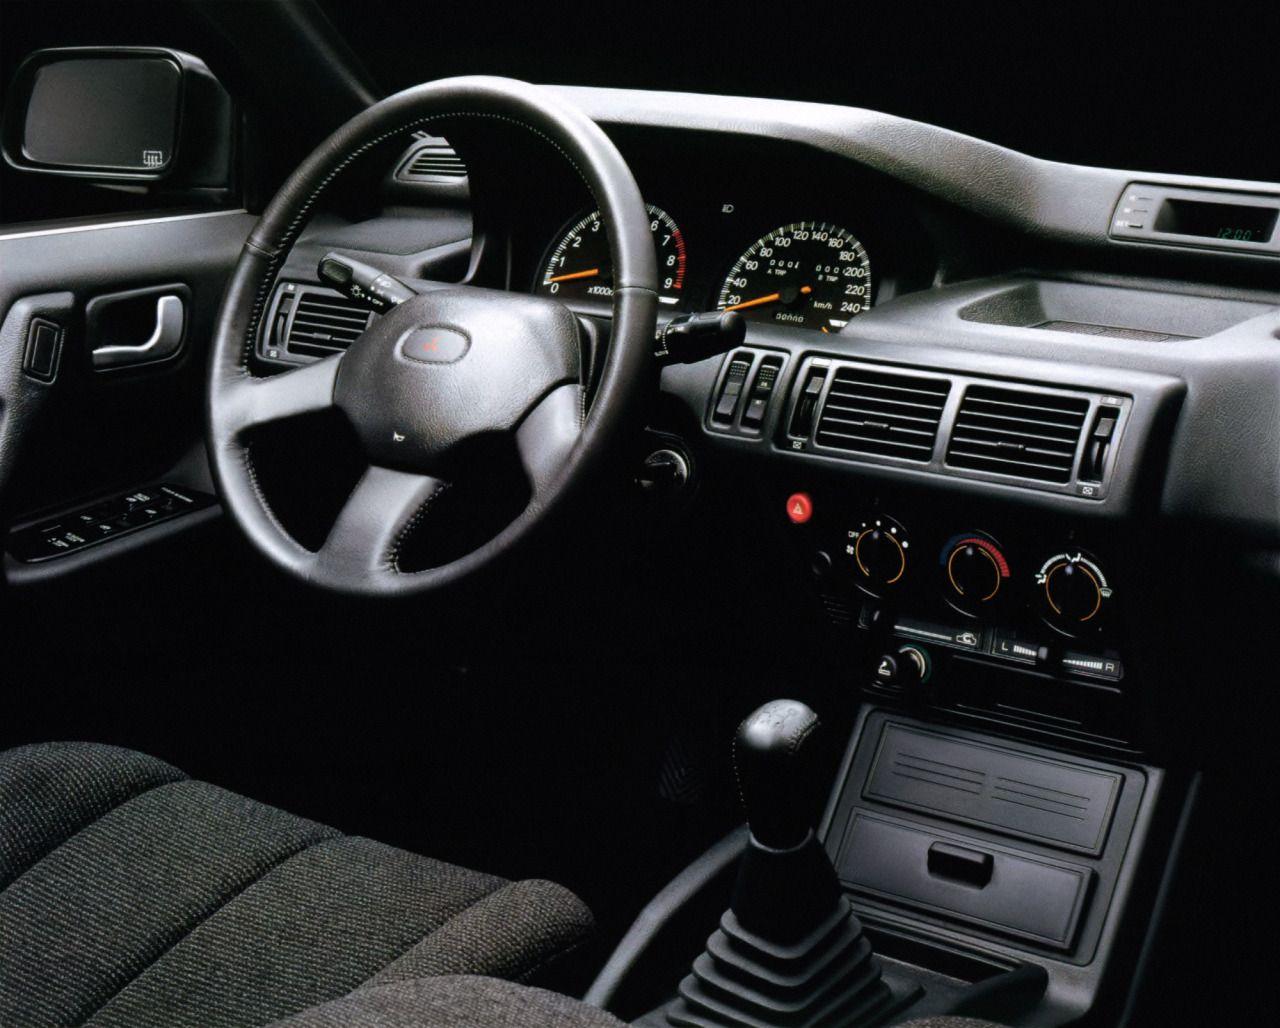 Car Interiors In 2020 Japan Motors Mitsubishi Galant Mitsubishi Motors